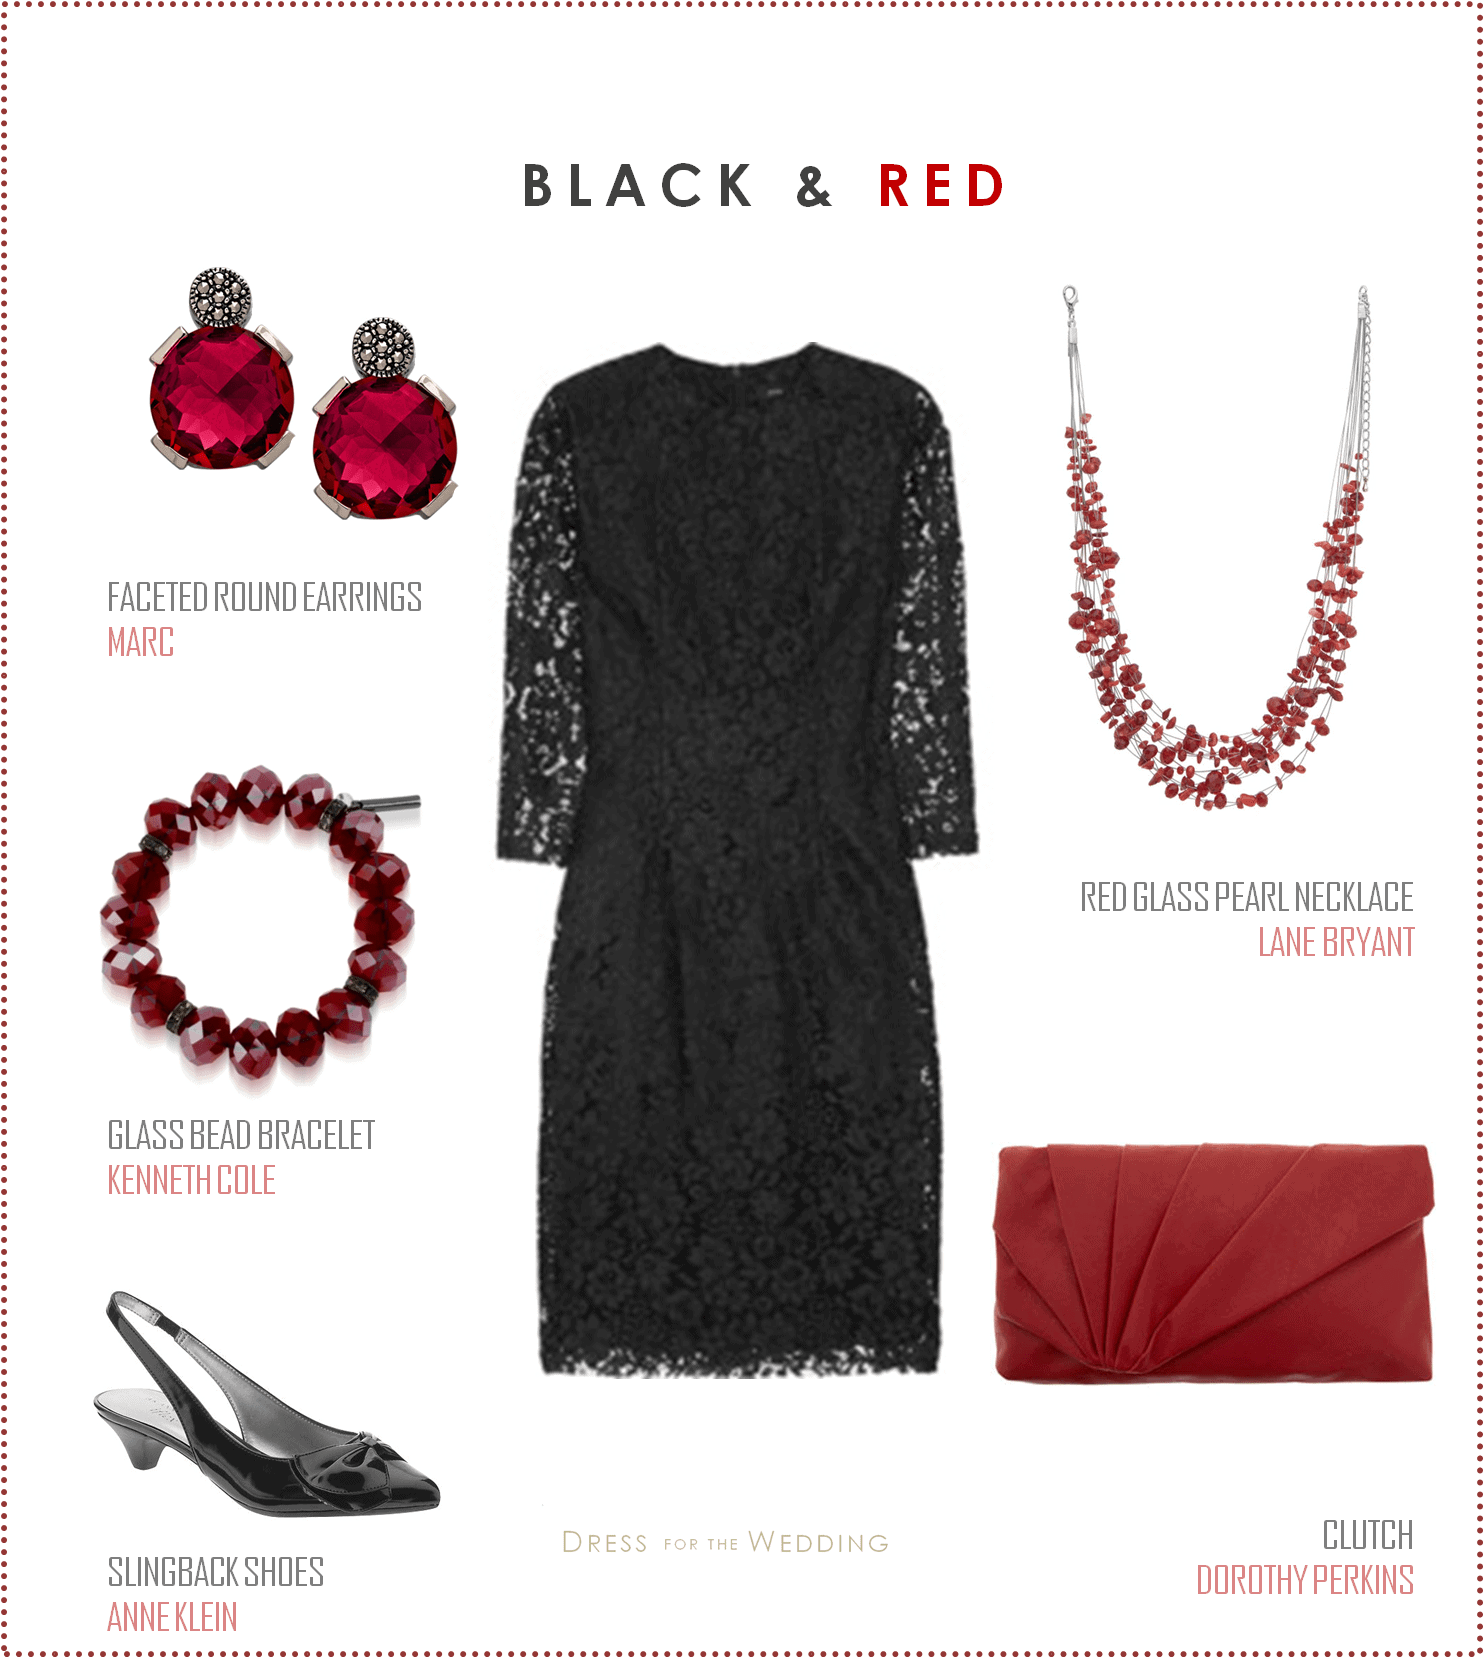 Accessories on black dress